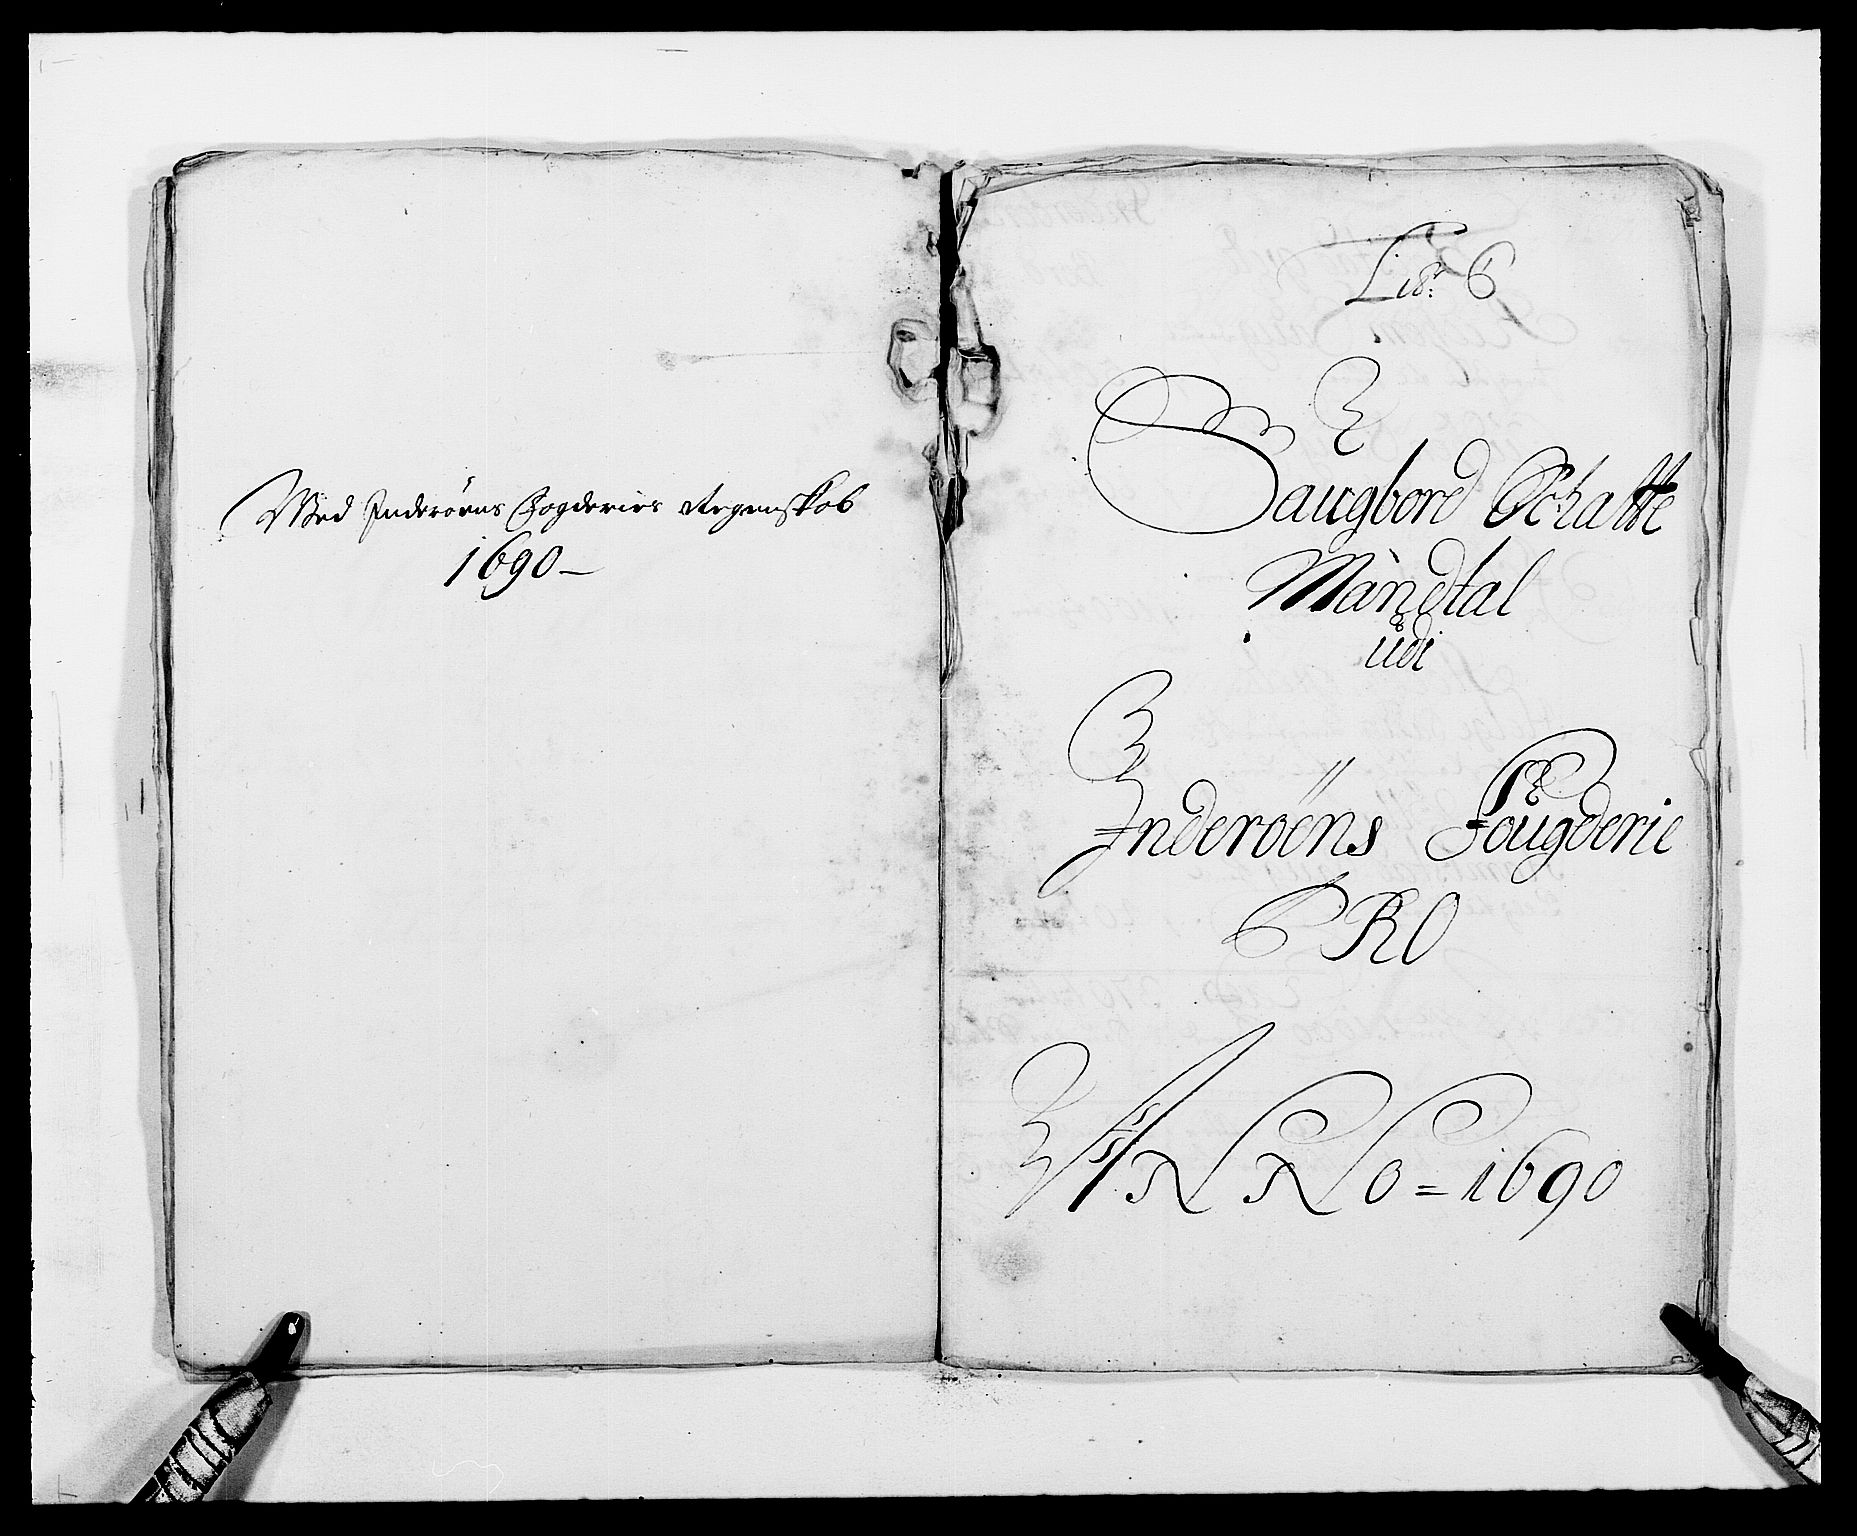 RA, Rentekammeret inntil 1814, Reviderte regnskaper, Fogderegnskap, R63/L4307: Fogderegnskap Inderøy, 1690-1691, s. 74